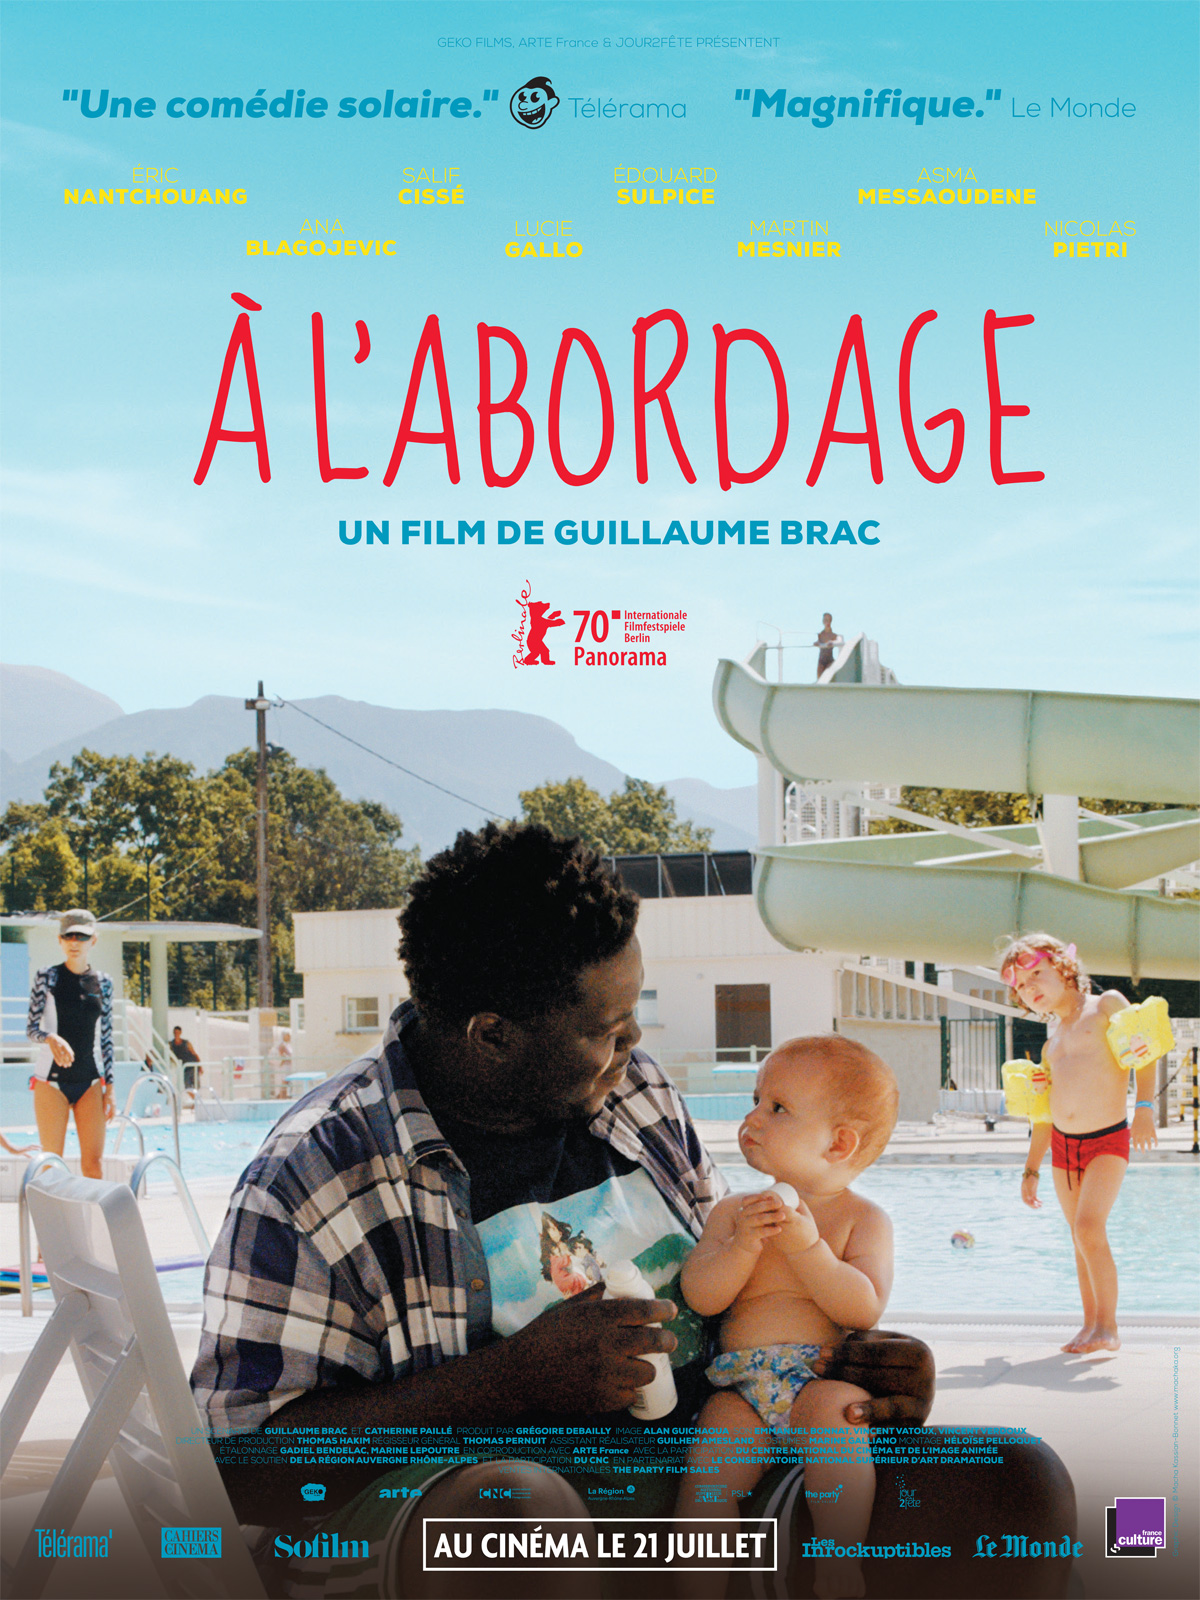 A L'ABORDAGE